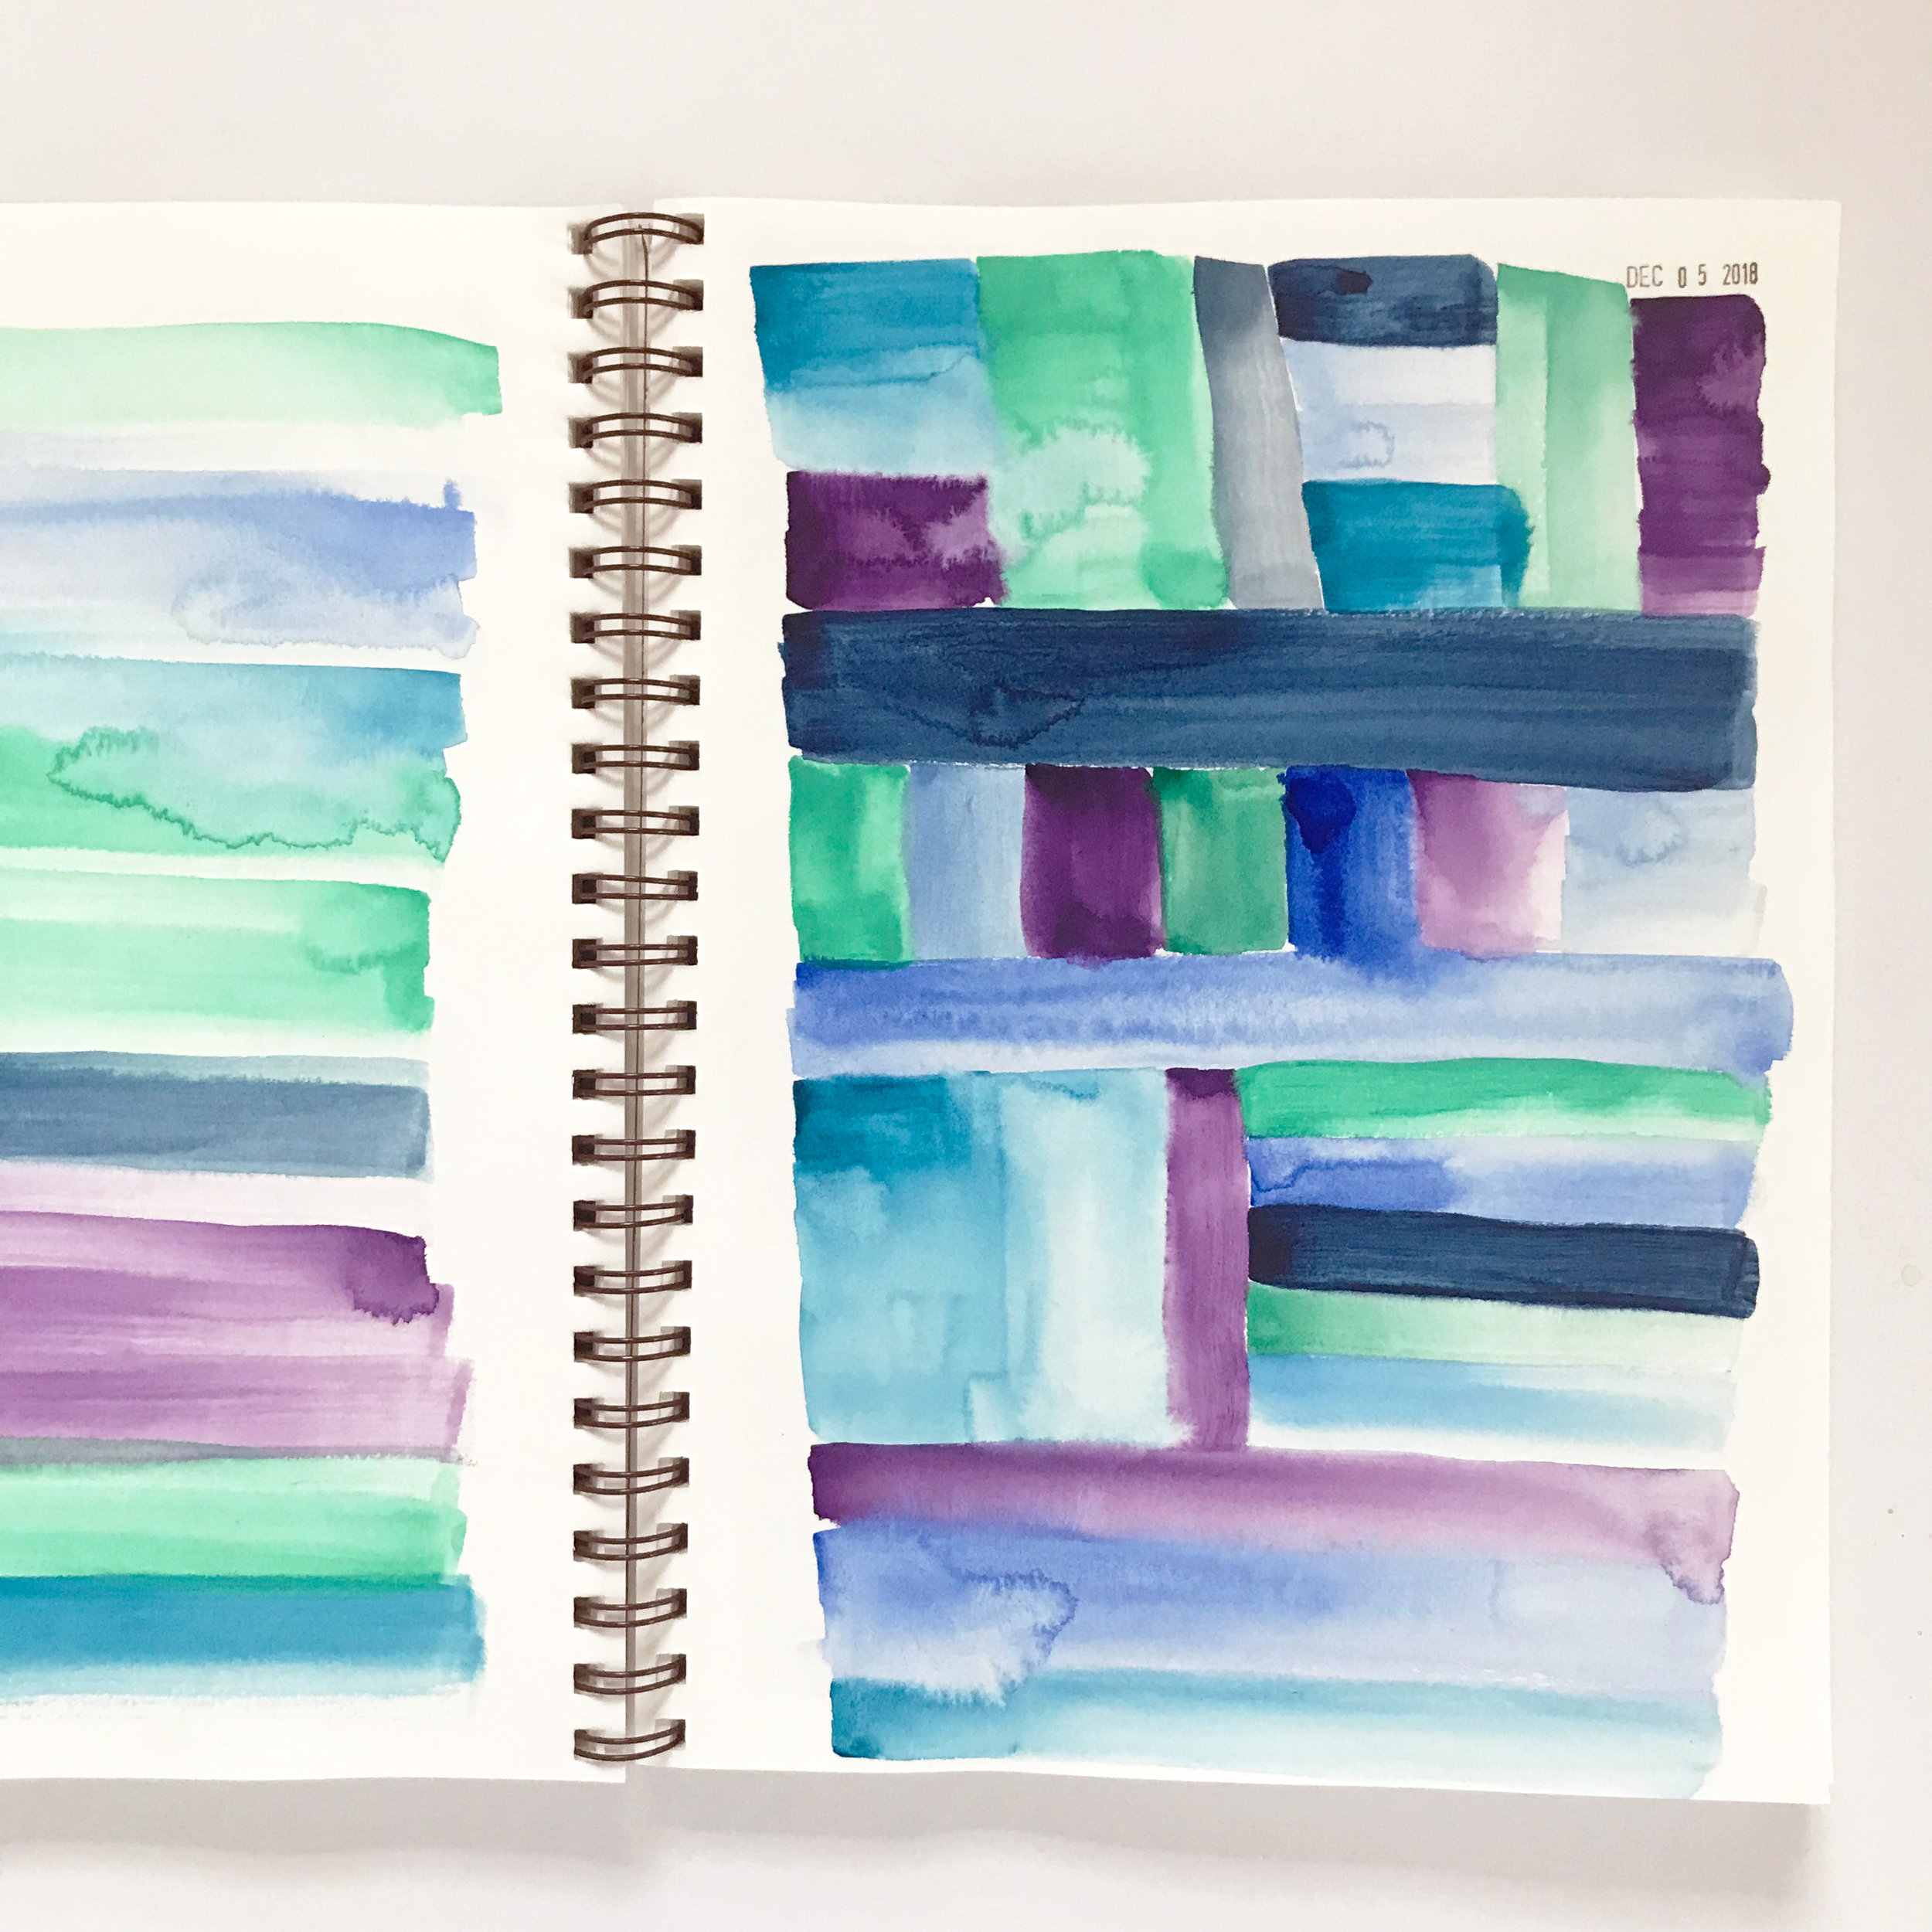 Playing Around with Kuretake Watercolors in My Sketchbook